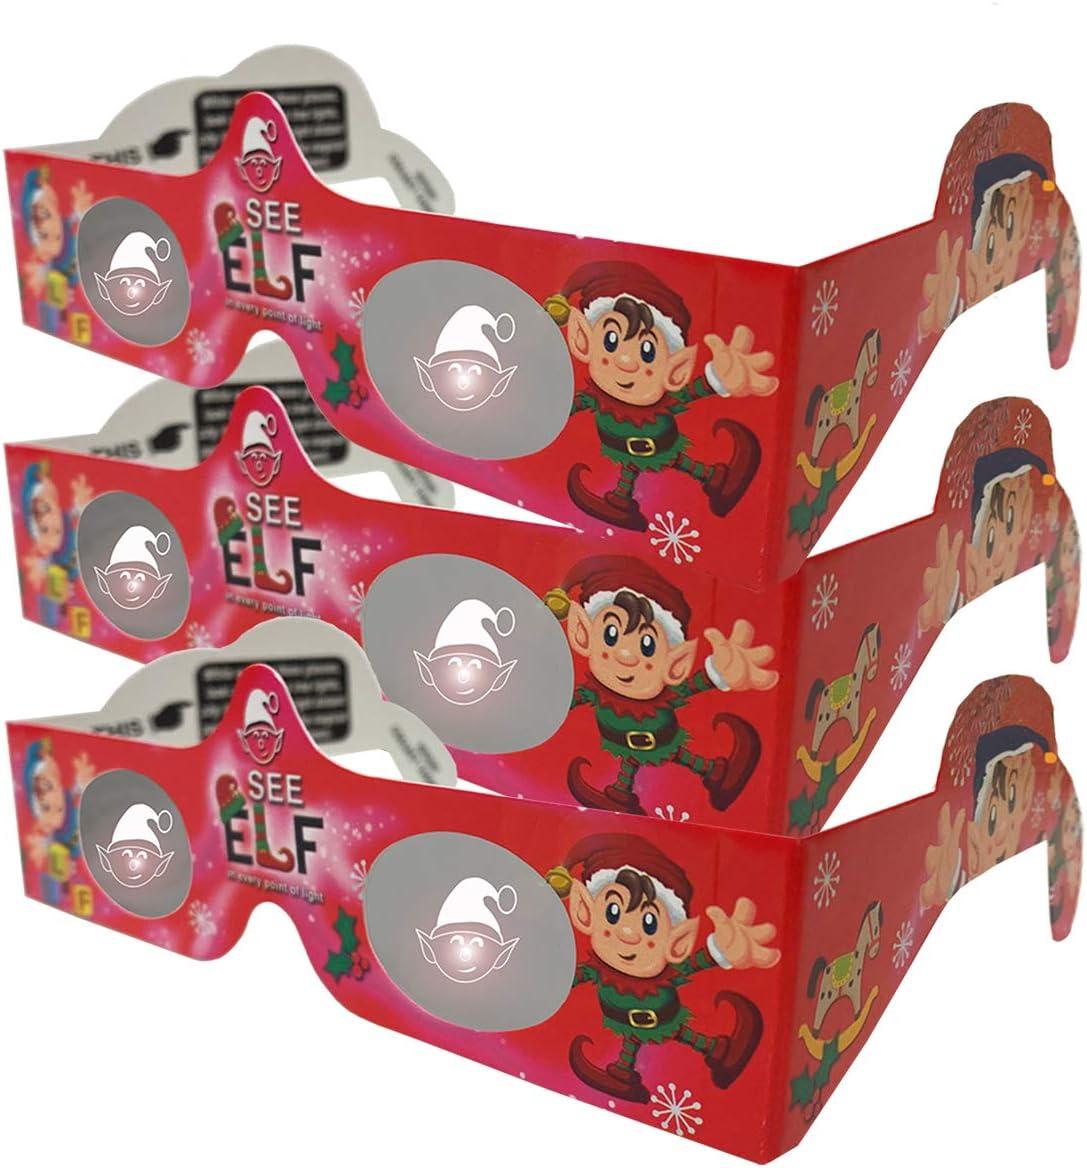 Christmas Glasses 5 ☆ very popular - Holiday Eyes -Elves Tran Pairs Specs Columbus Mall 3